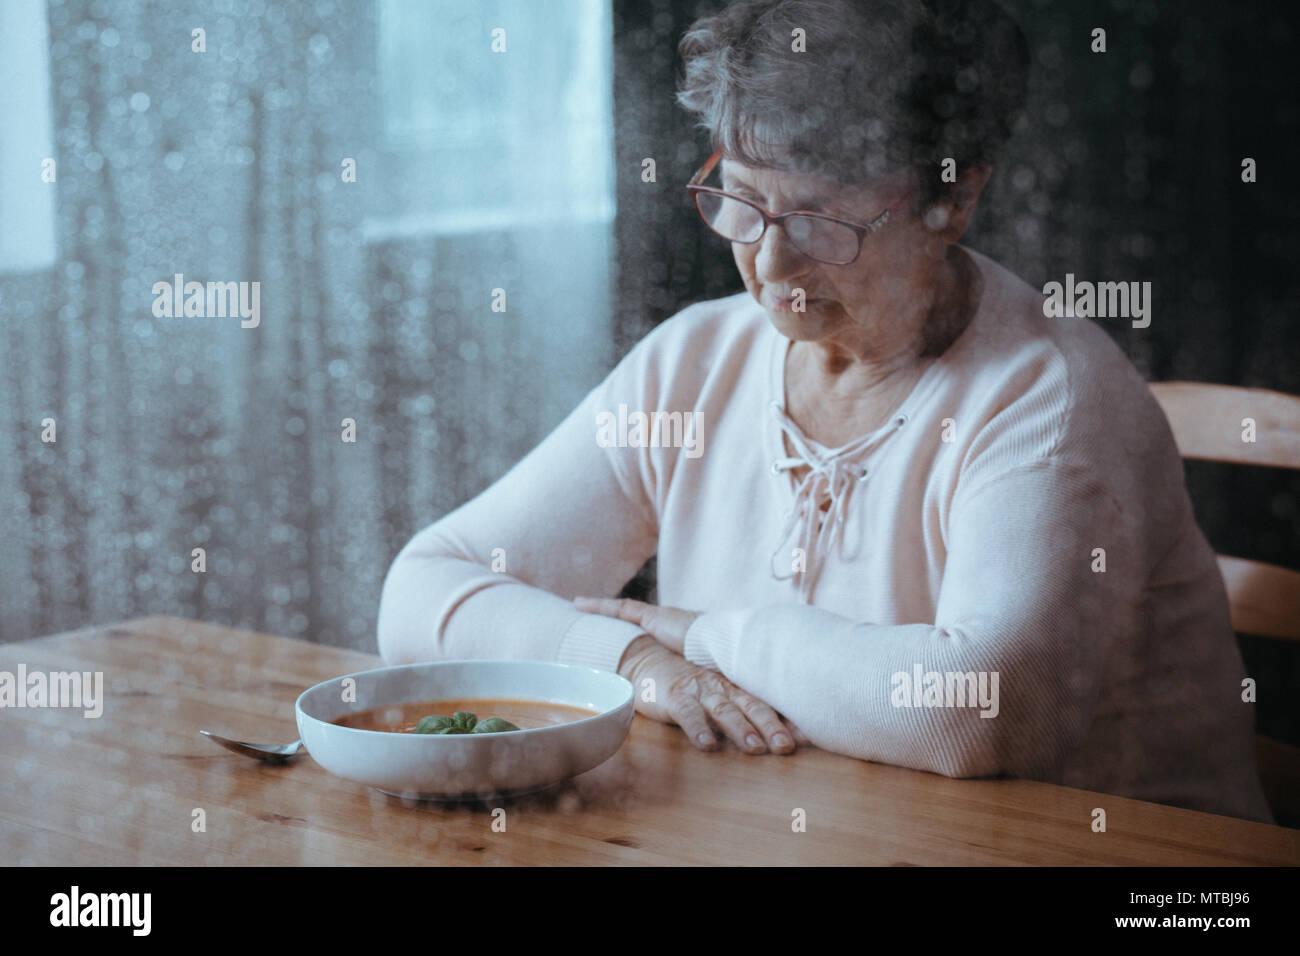 Traurig, ältere Frau, Appetitlosigkeit Stockbild